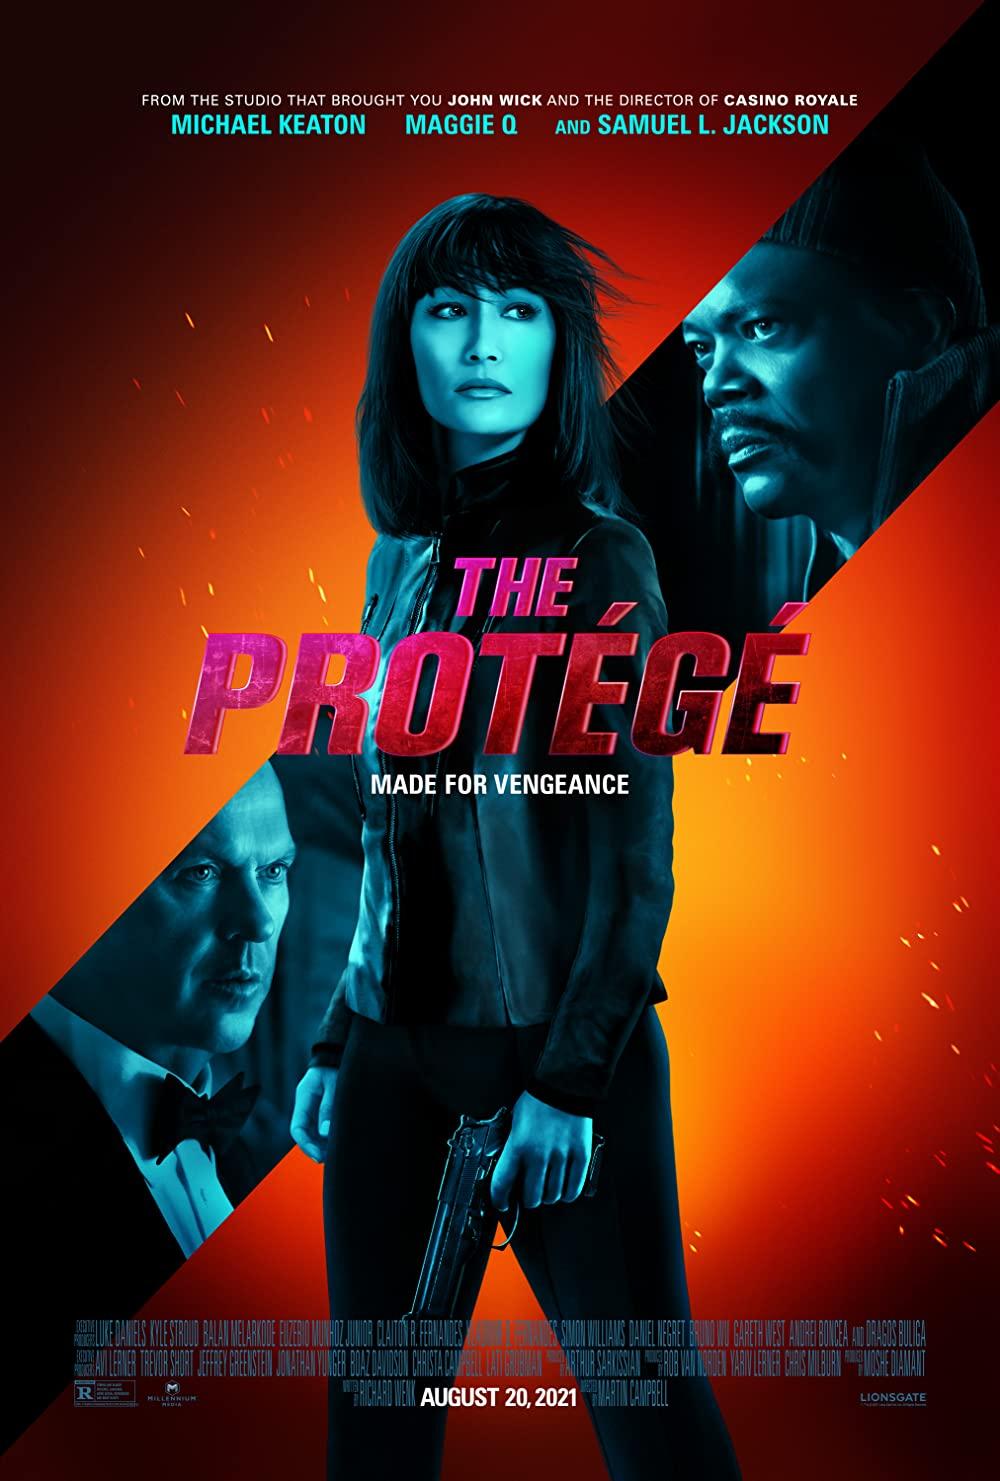 Poster for The Protégé